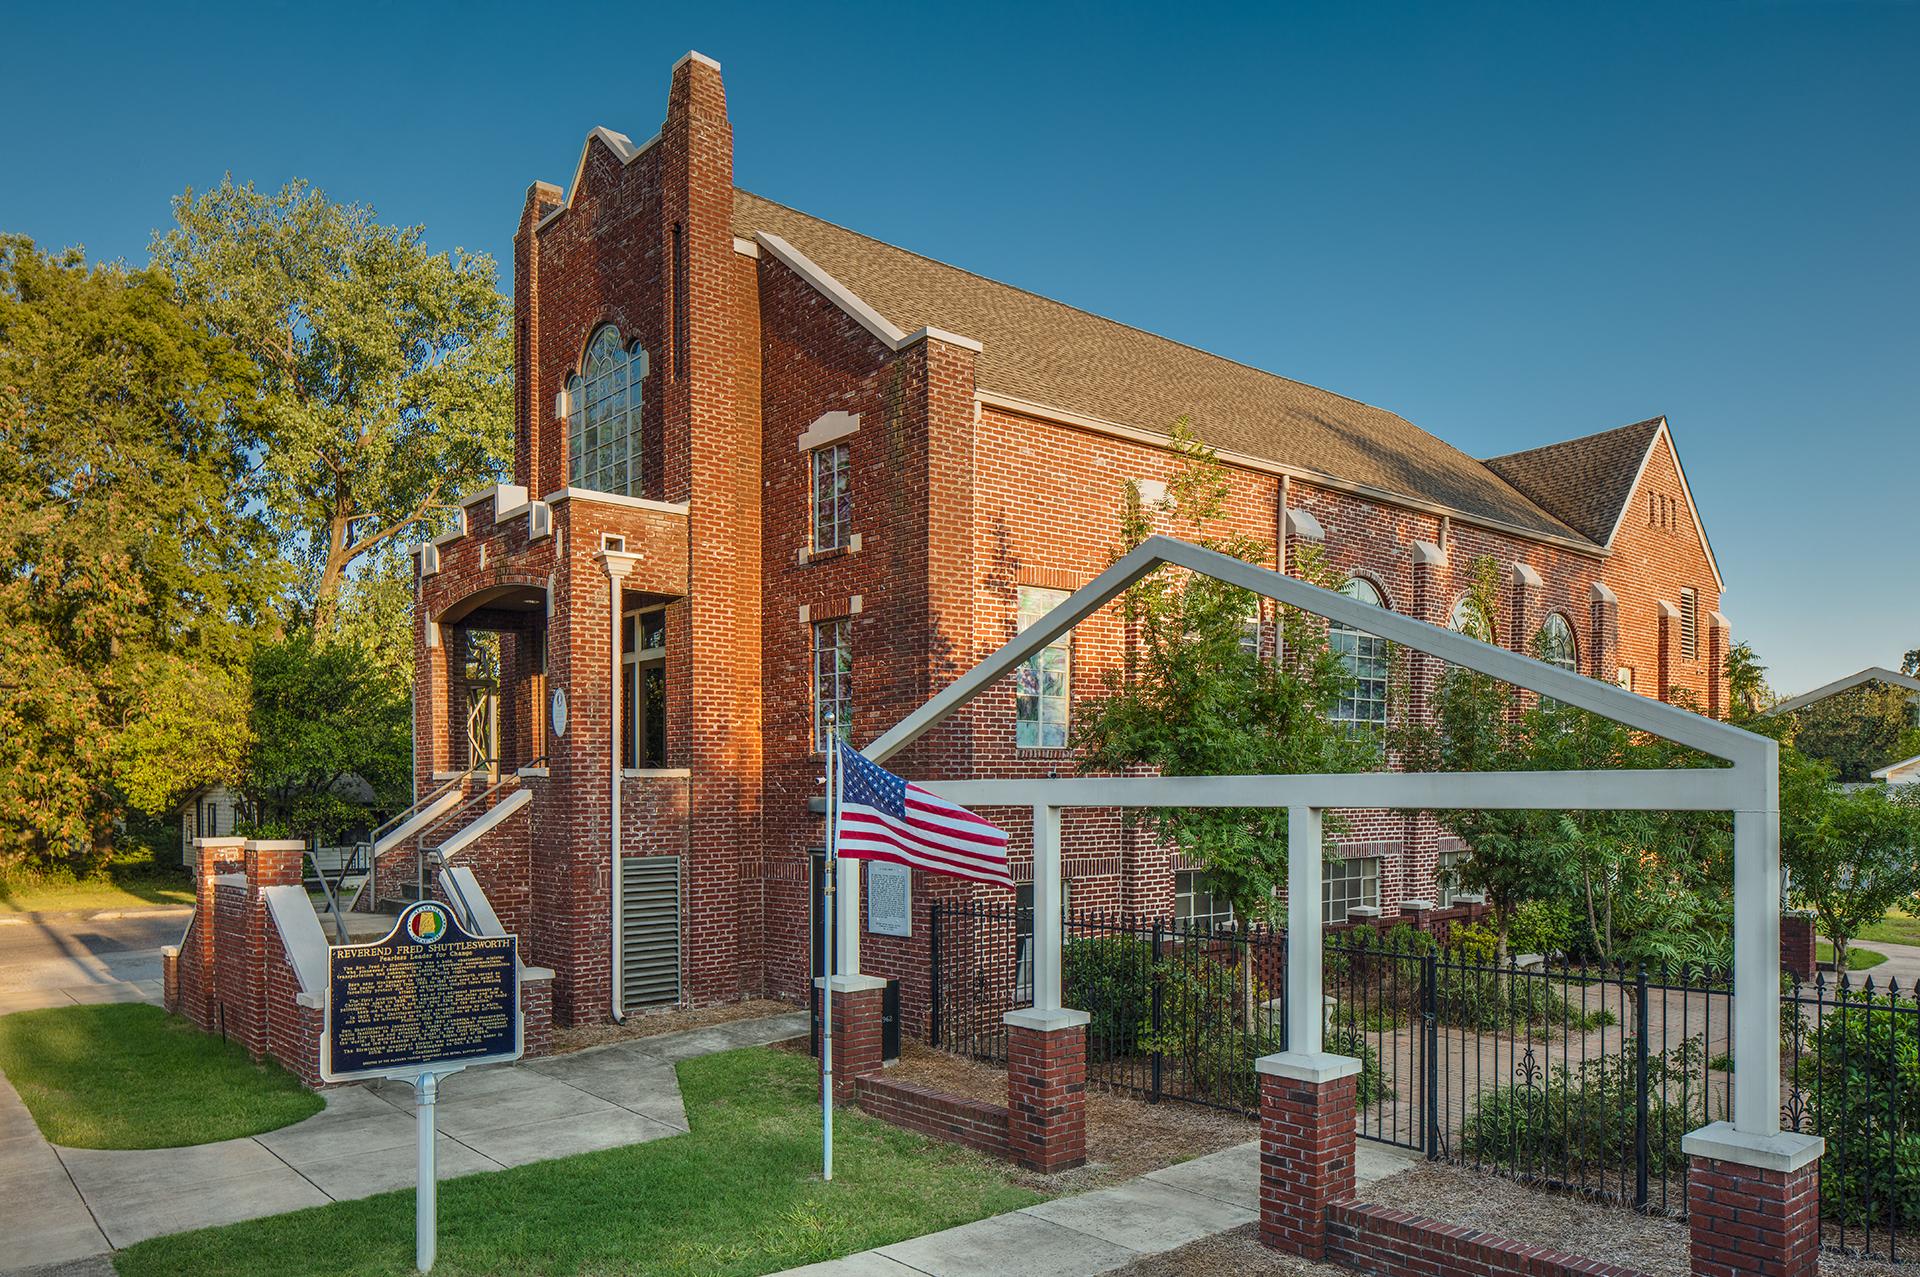 Historic Bethel Baptist Church in Collegeville